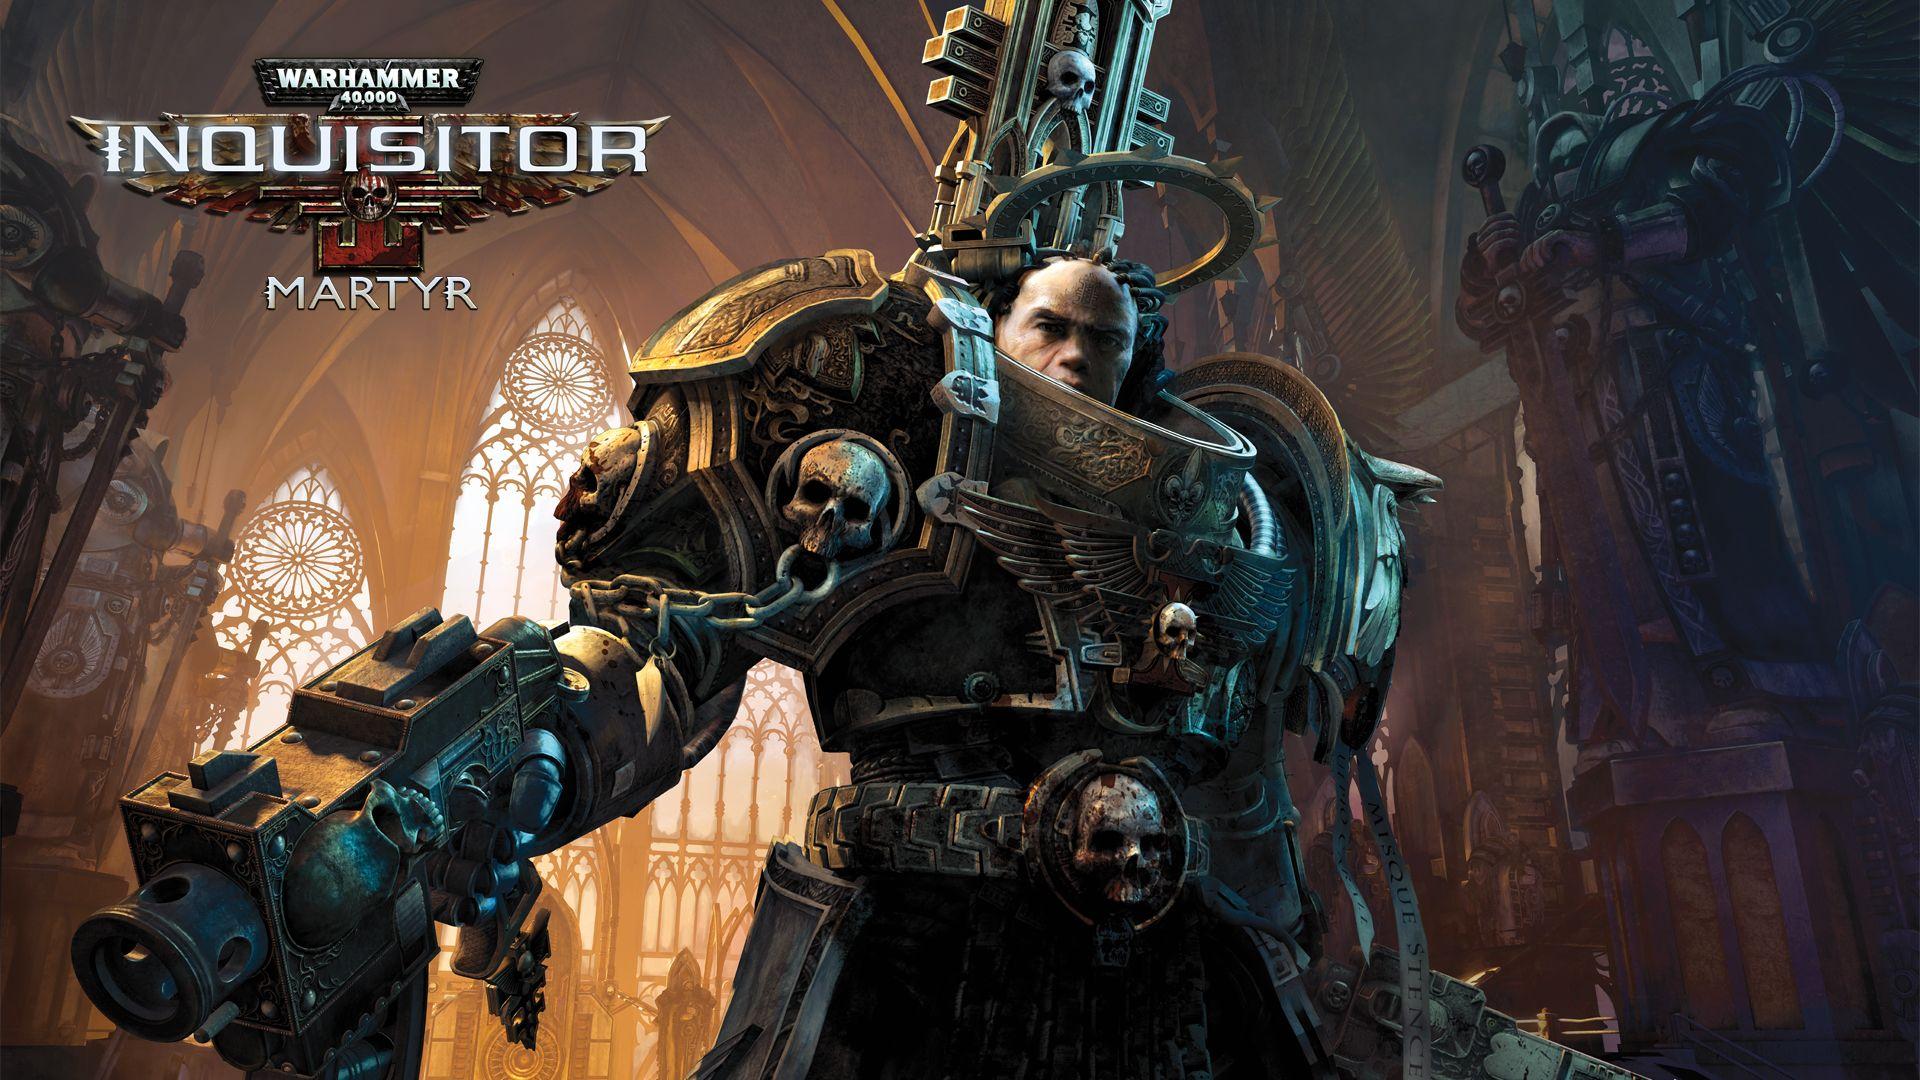 W40k Inquisitor Martyr Wallpaper Warhammer Warhammer 40k Martyrs